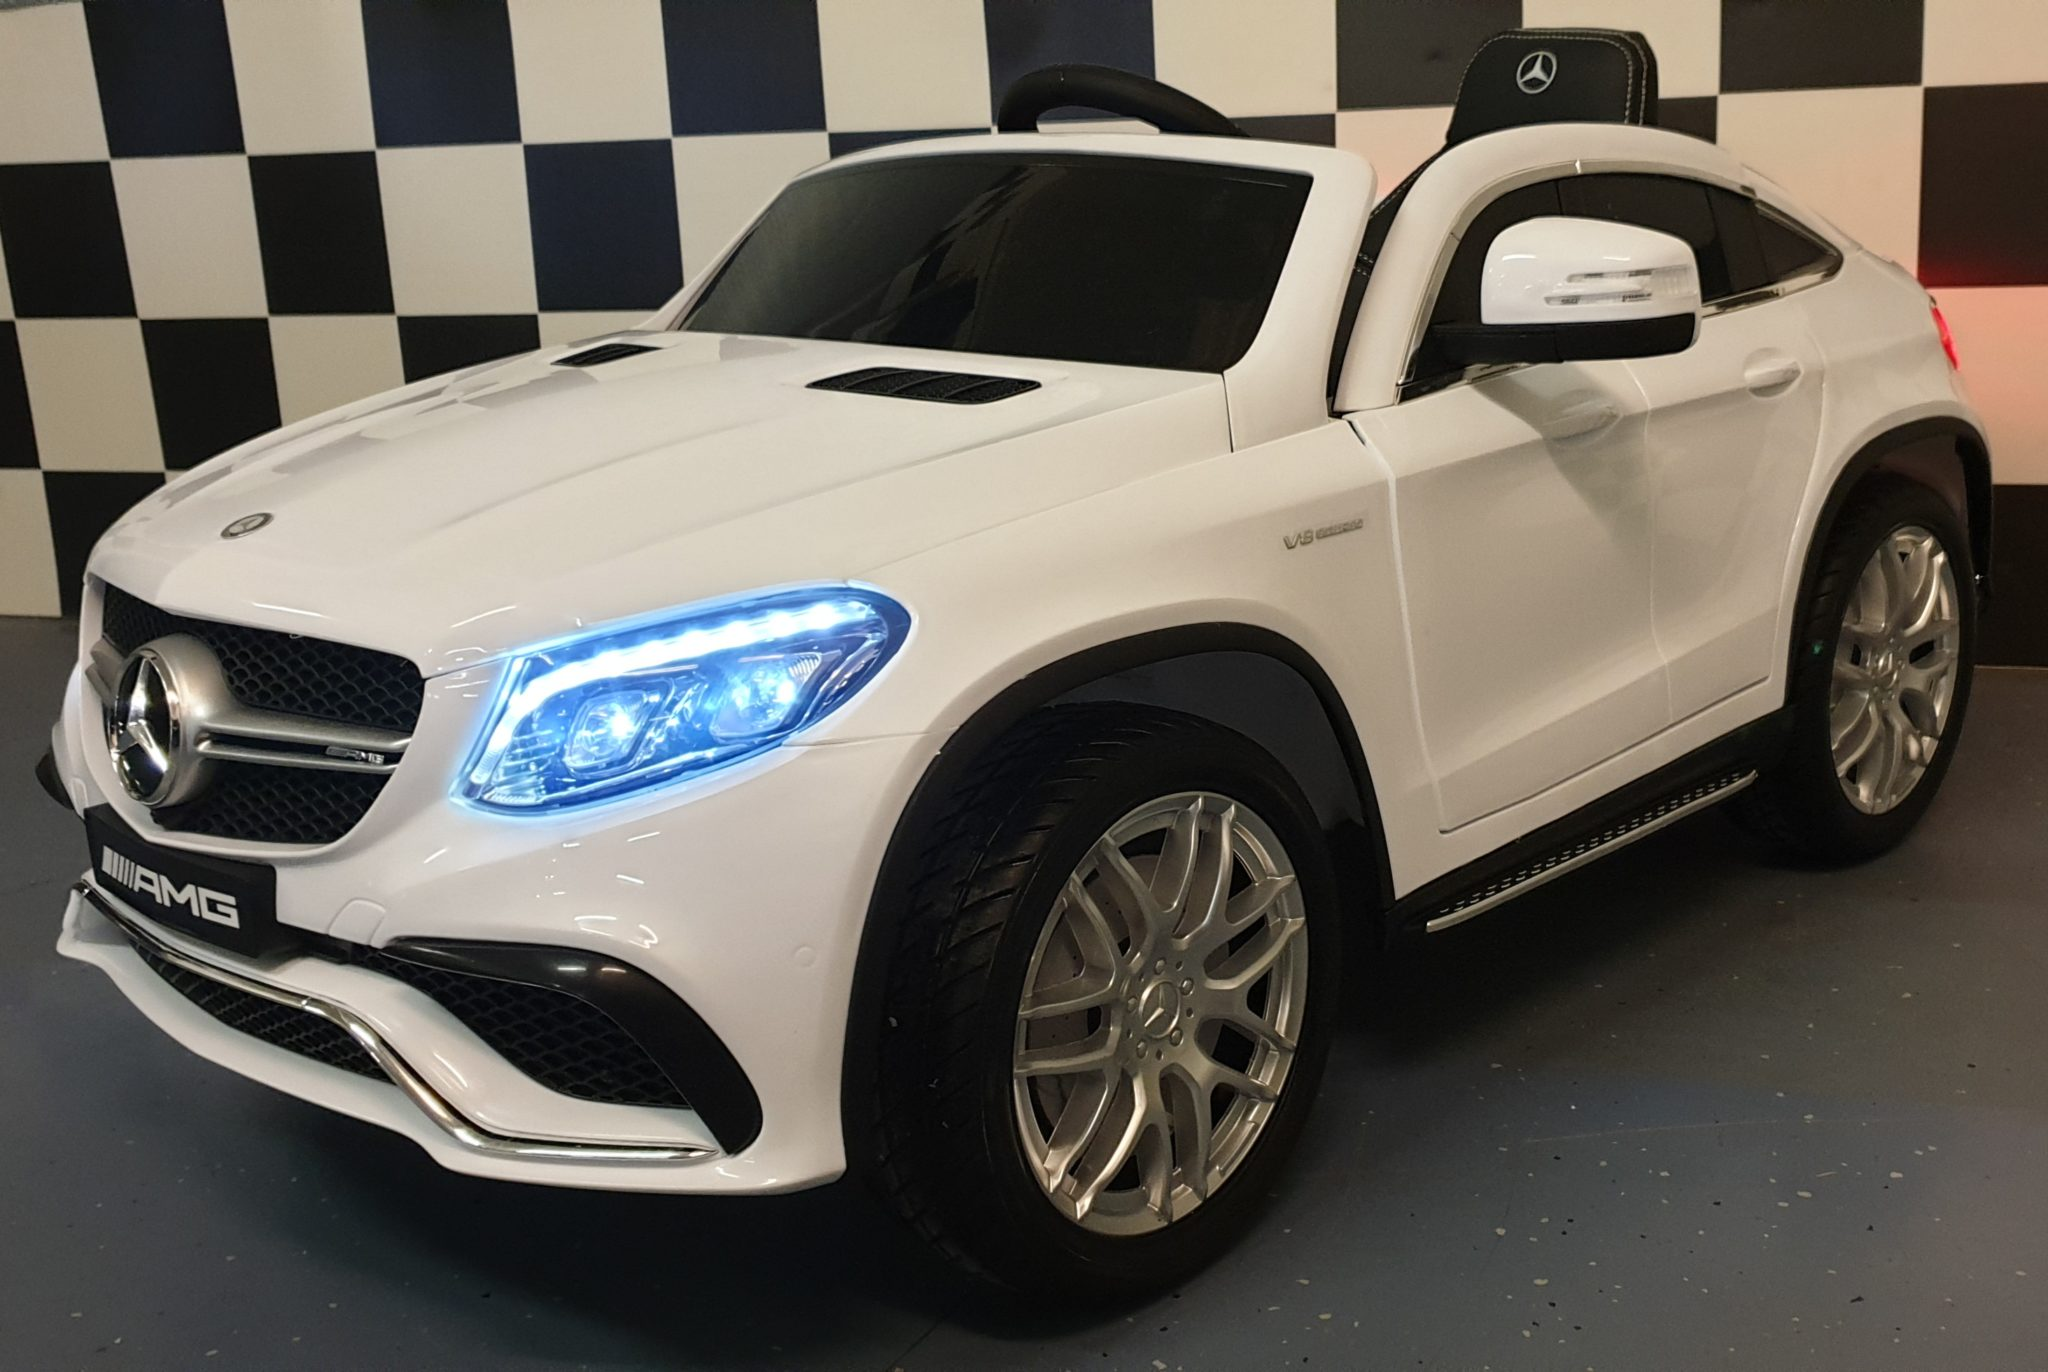 Accu speelgoedauto Mercedes GLE AMG 12 volt 2.4G RC Cars4kids